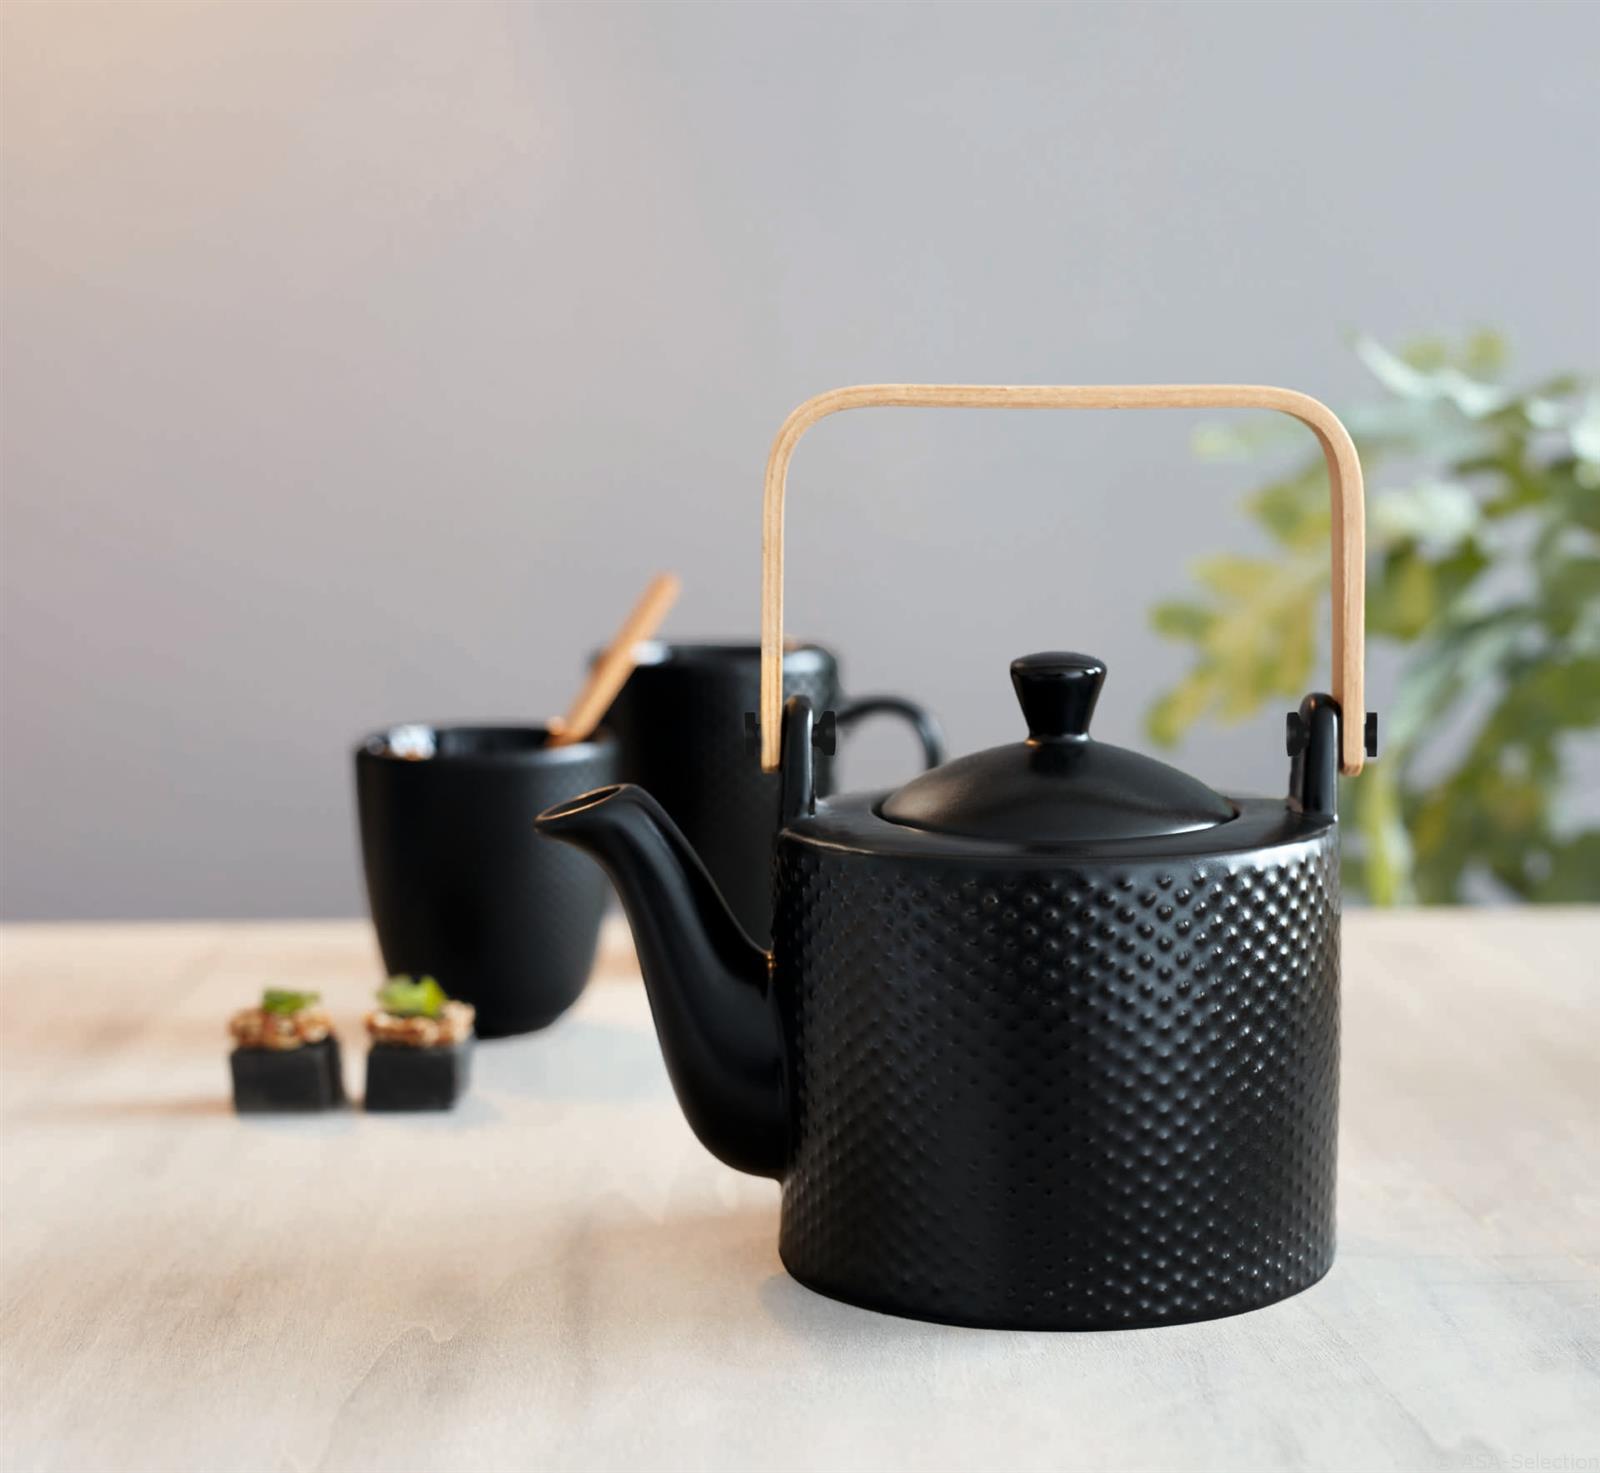 asa teekanne linna waben schwarz eur 30 20. Black Bedroom Furniture Sets. Home Design Ideas